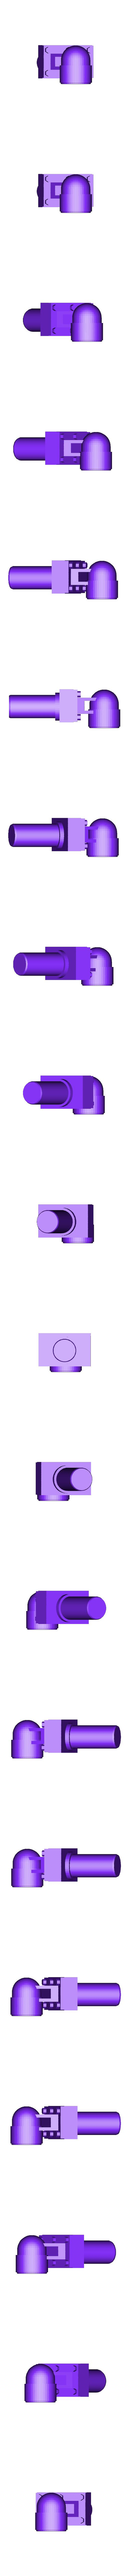 Jawa Shuttle scooter (spotlight).stl Download free STL file Jawa Shuttle Scooter • 3D printer template, polerix